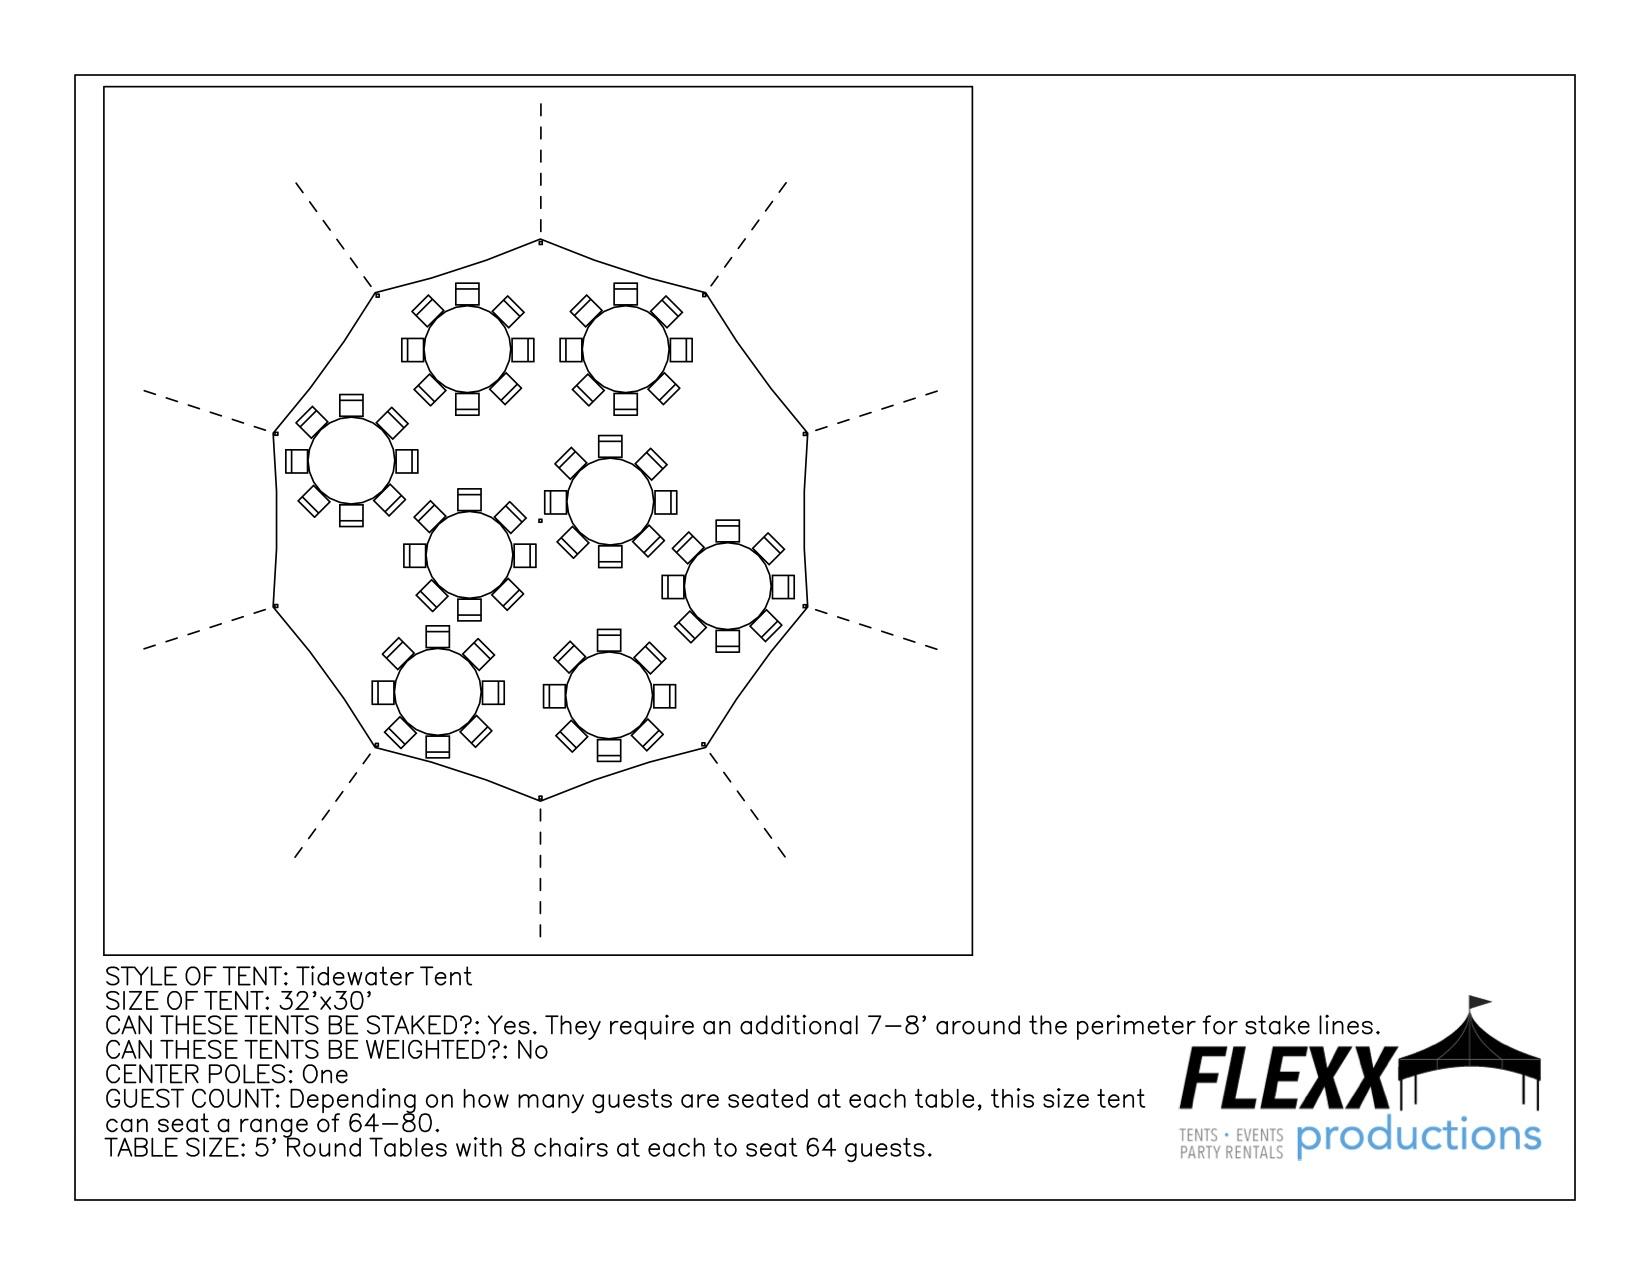 32x30 Flexx Productions Tidewater Tent Layout